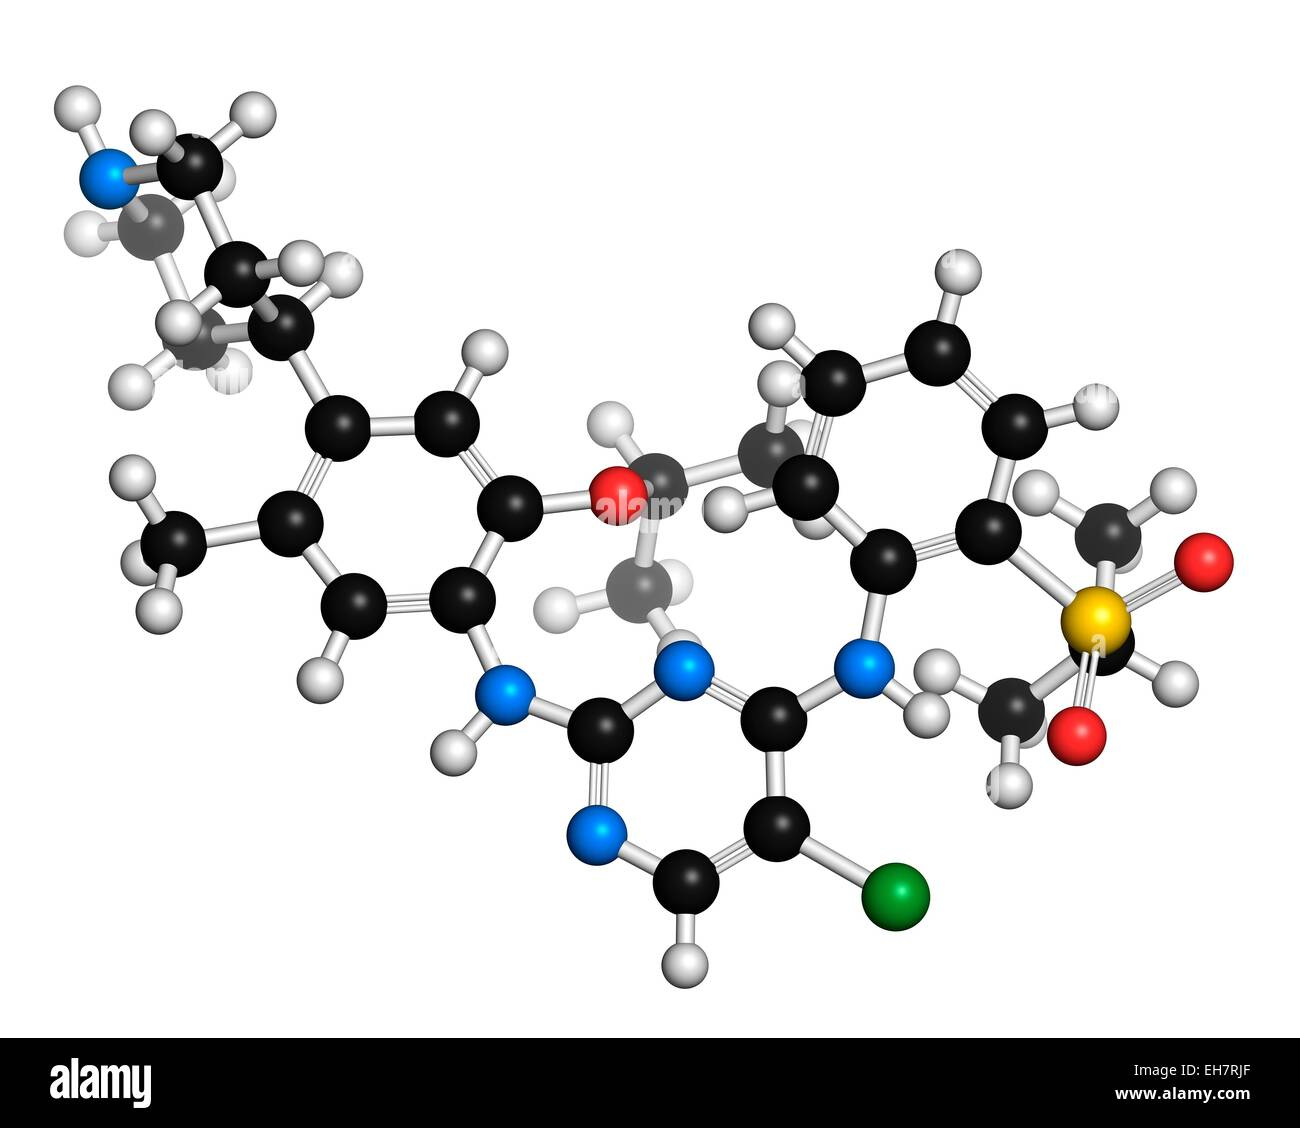 Ceritinib cancer drug molecule - Stock Image